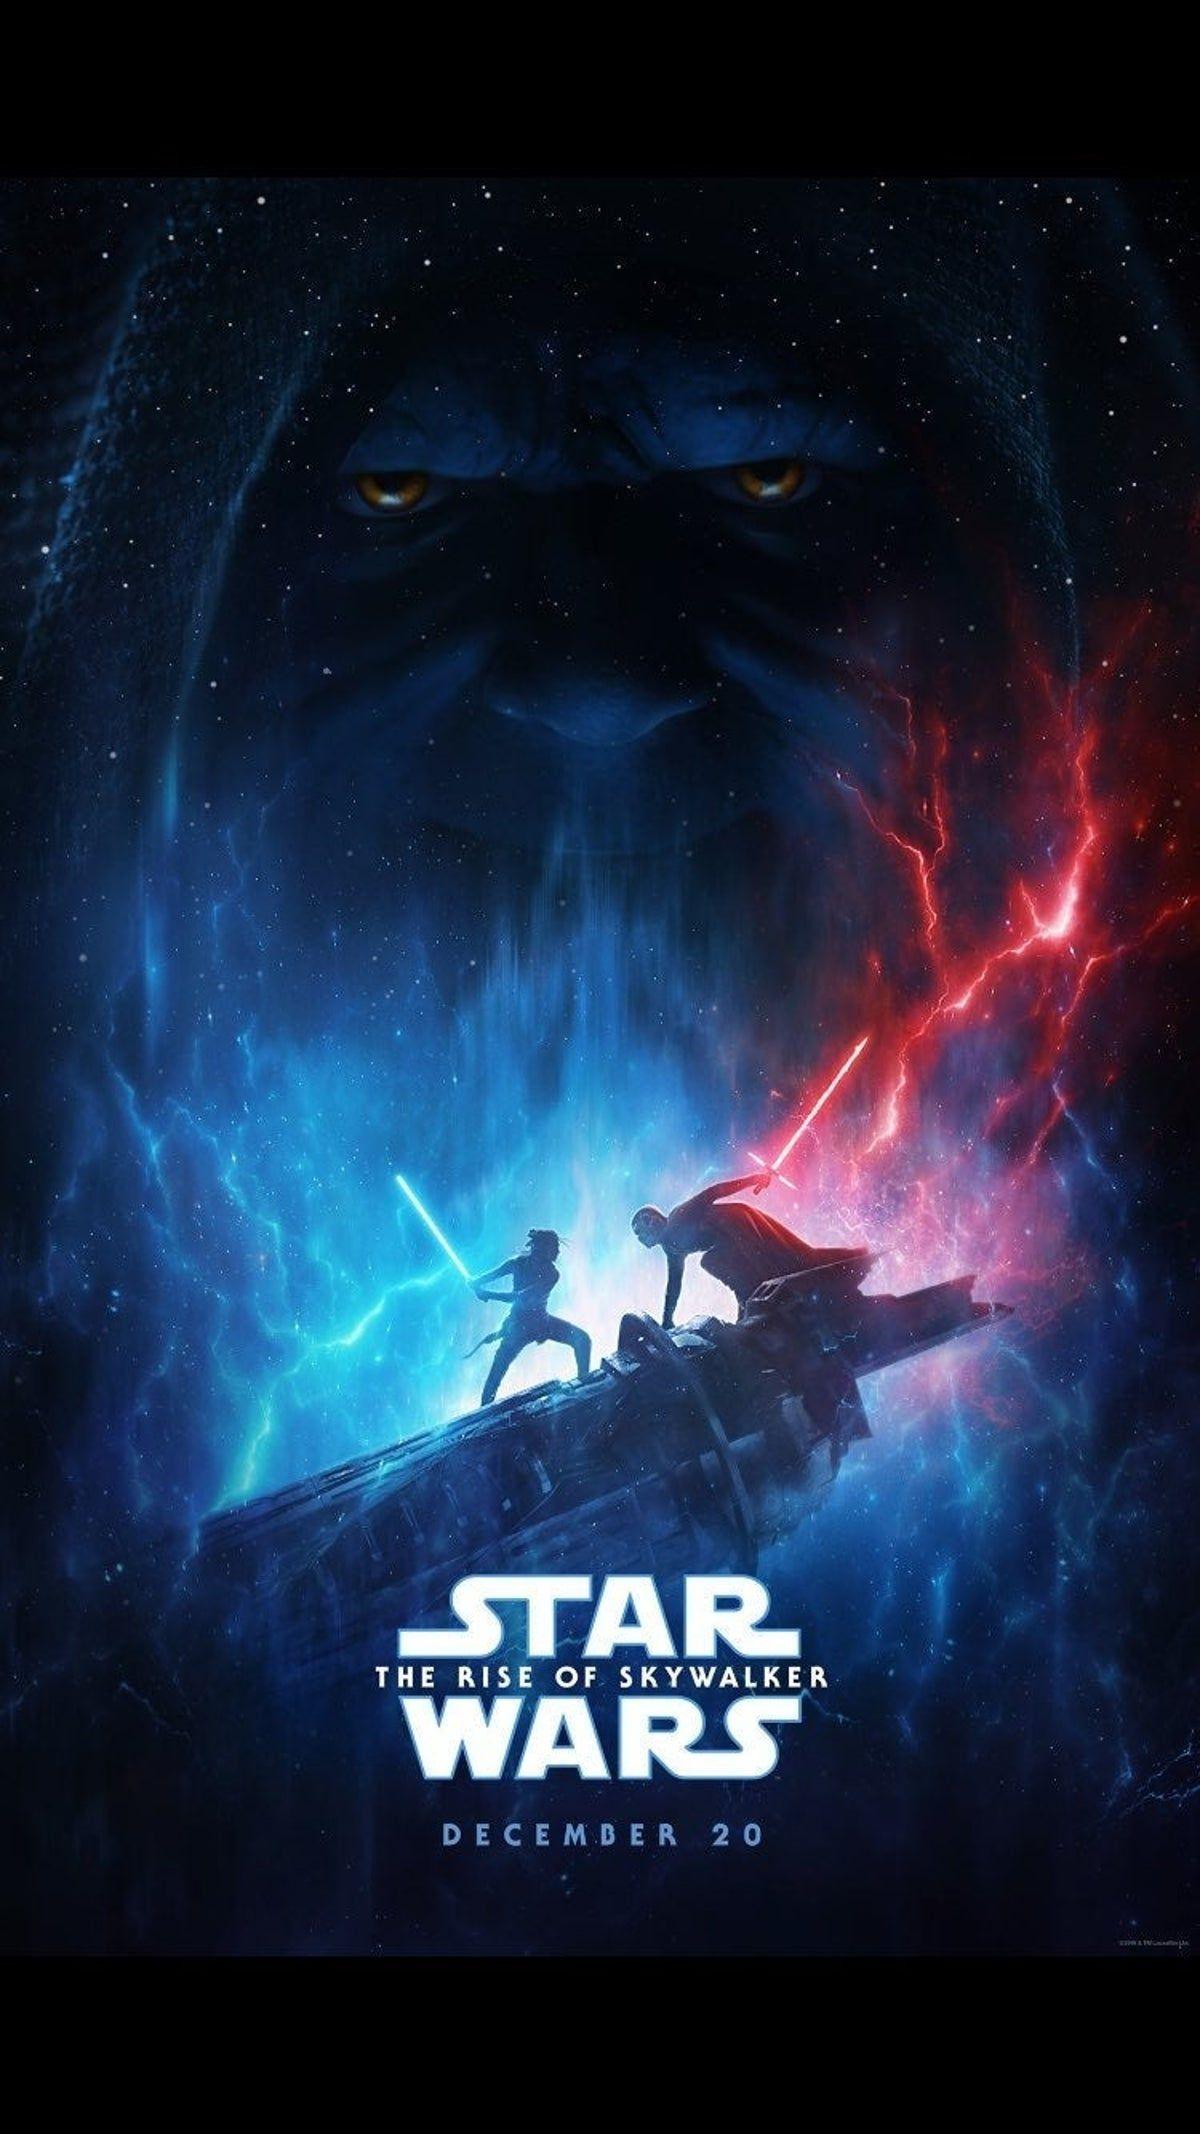 D23 Rise Of Skywalker Movie Poster In 2020 Star Wars Wallpaper Iphone Star Wars Poster Star Wars Images